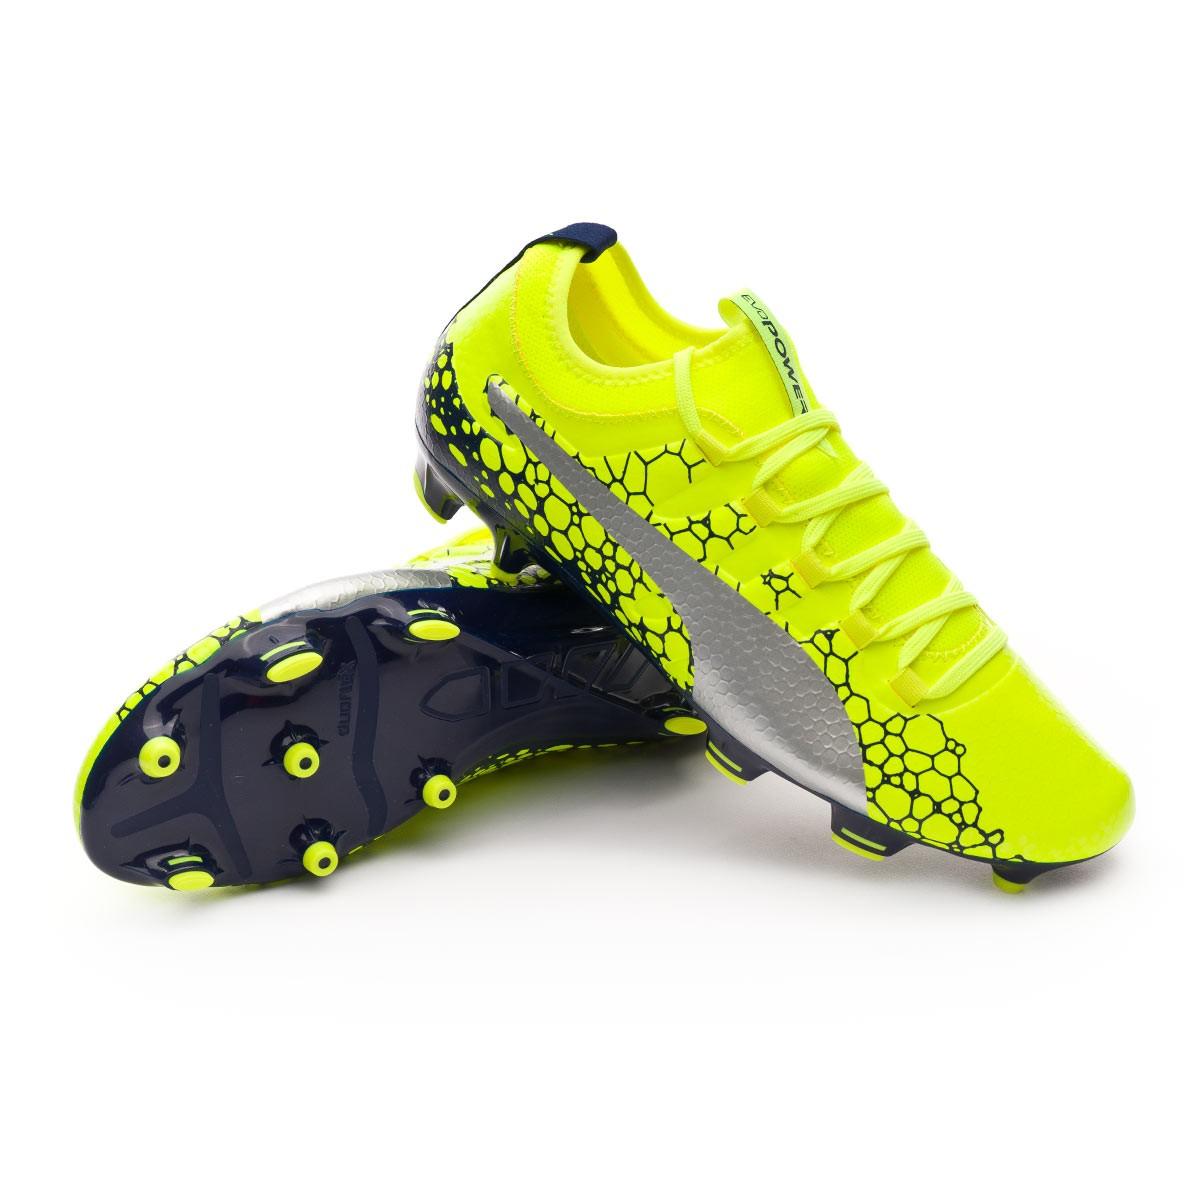 438ada0750fd Football Boots Puma evoPOWER Vigor 3 Graphic FG Safety yellow-Silver ...